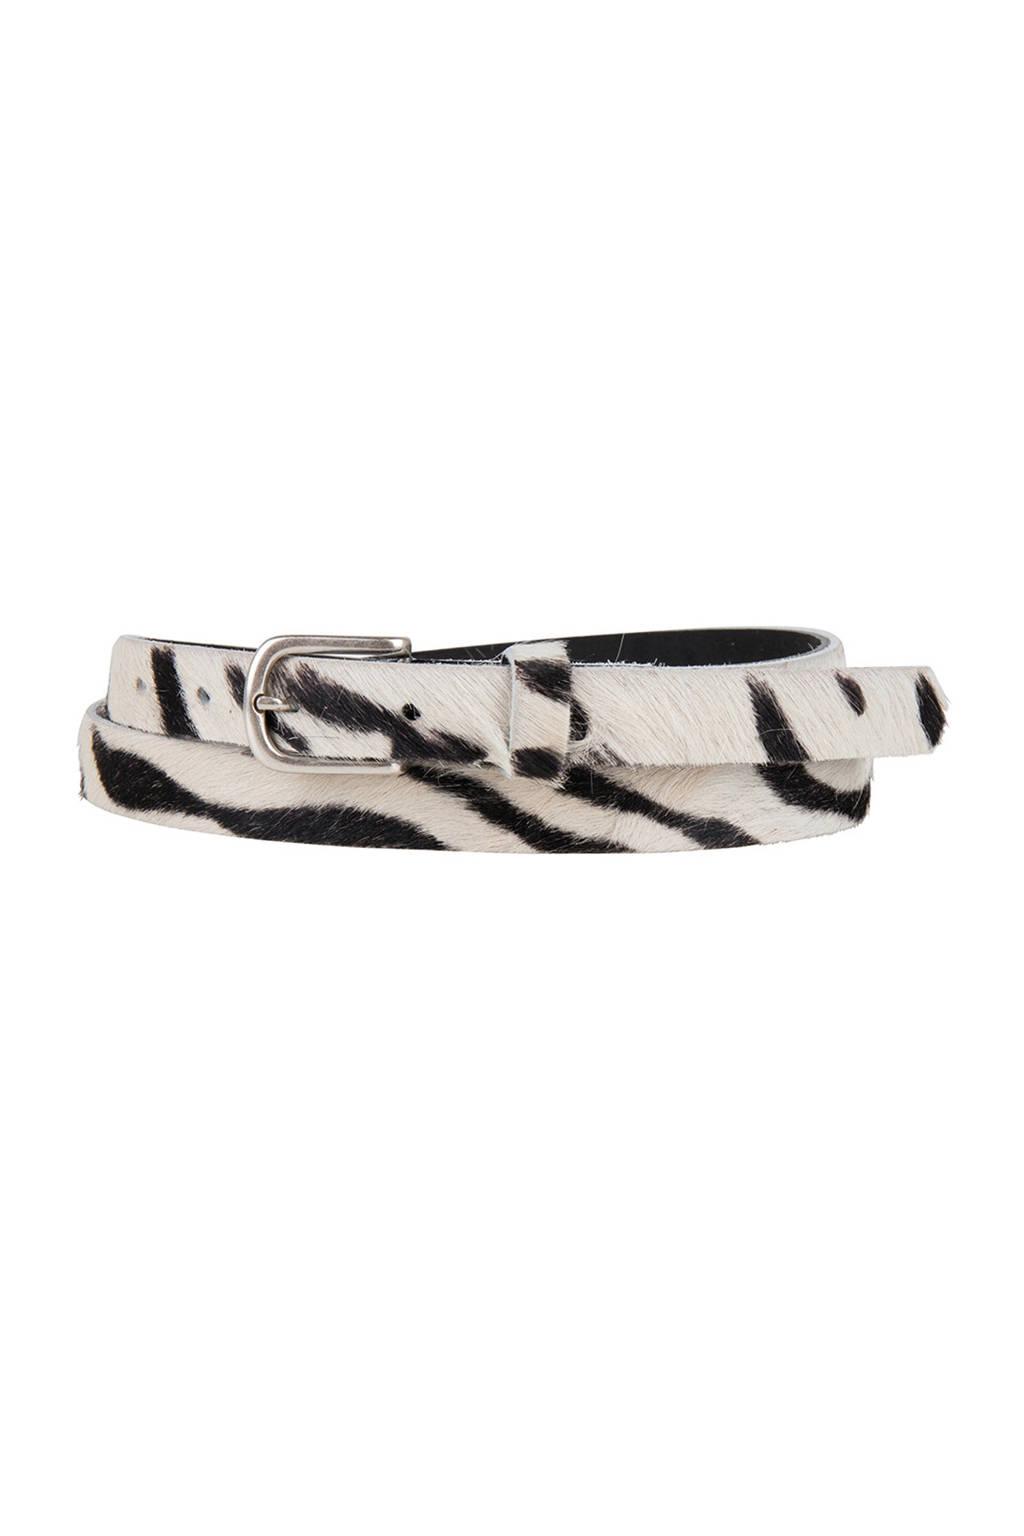 Cowboysbelt leren riem 209142 zebraprint, Wit/zwart